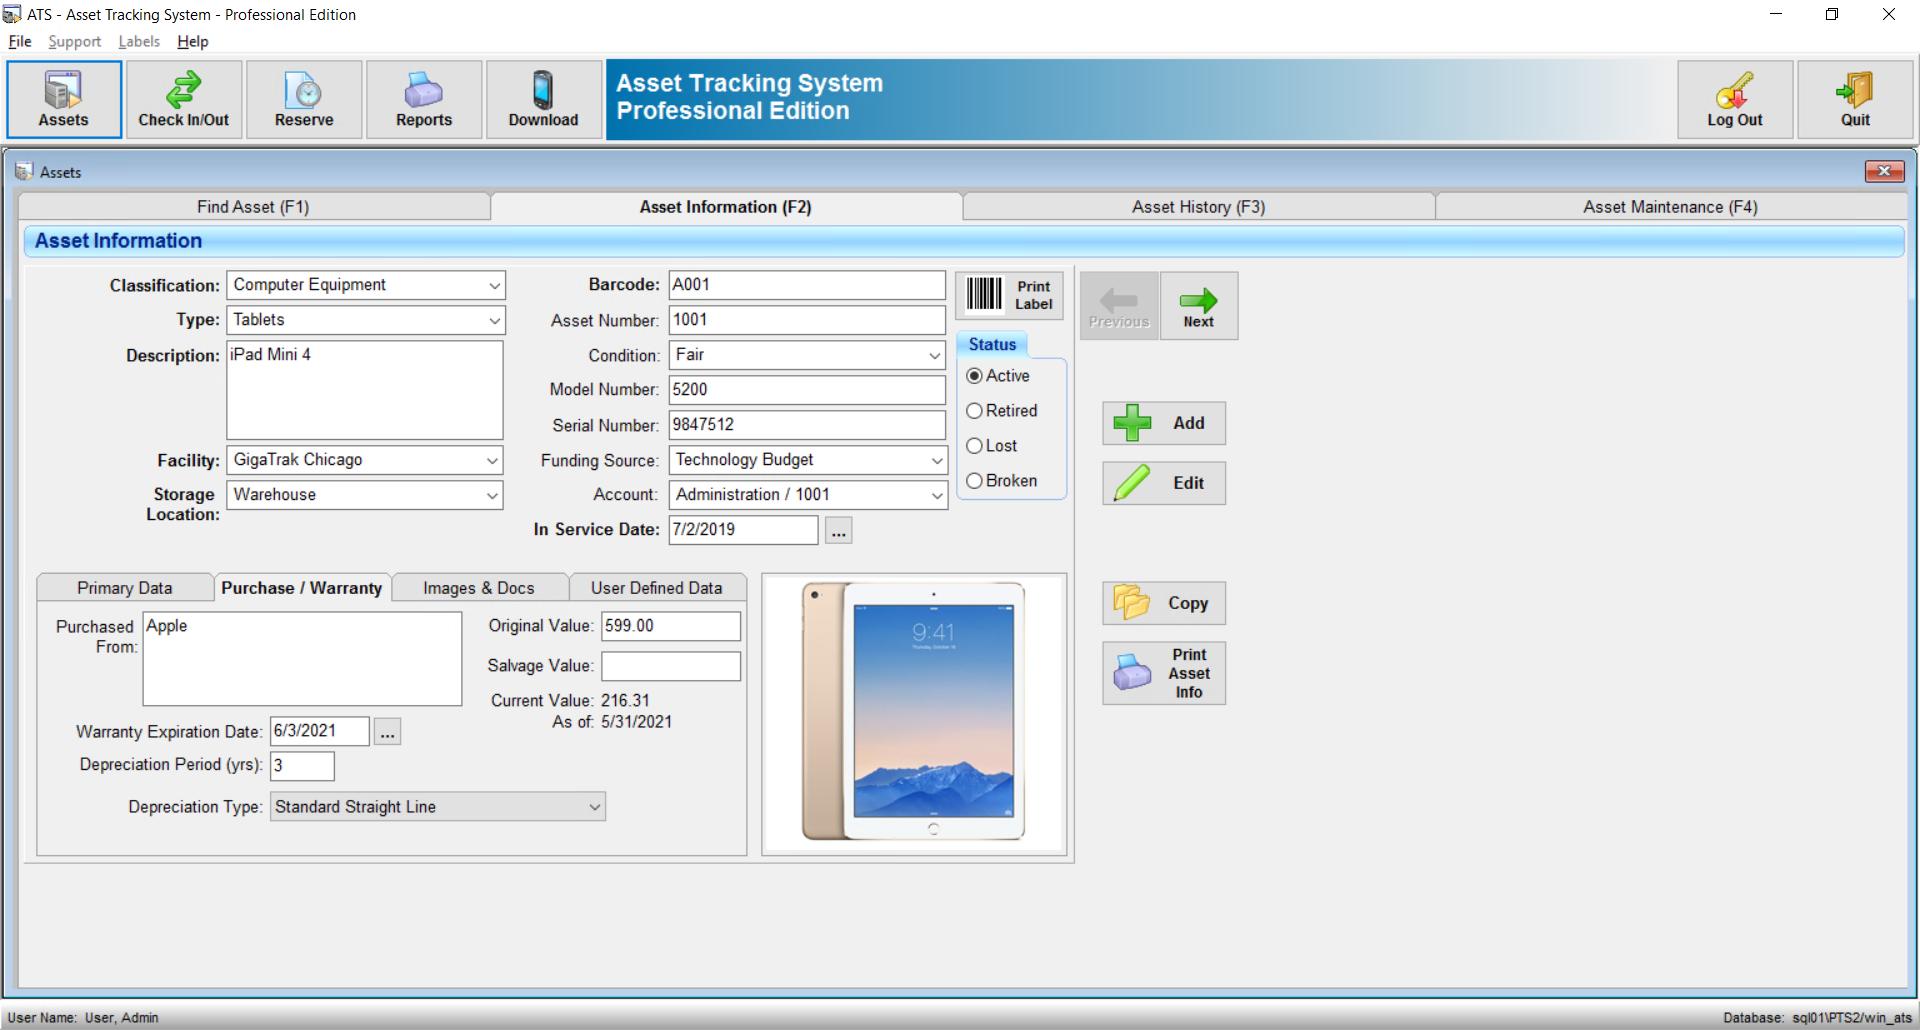 GigaTrak Asset Tracking System Software - 3